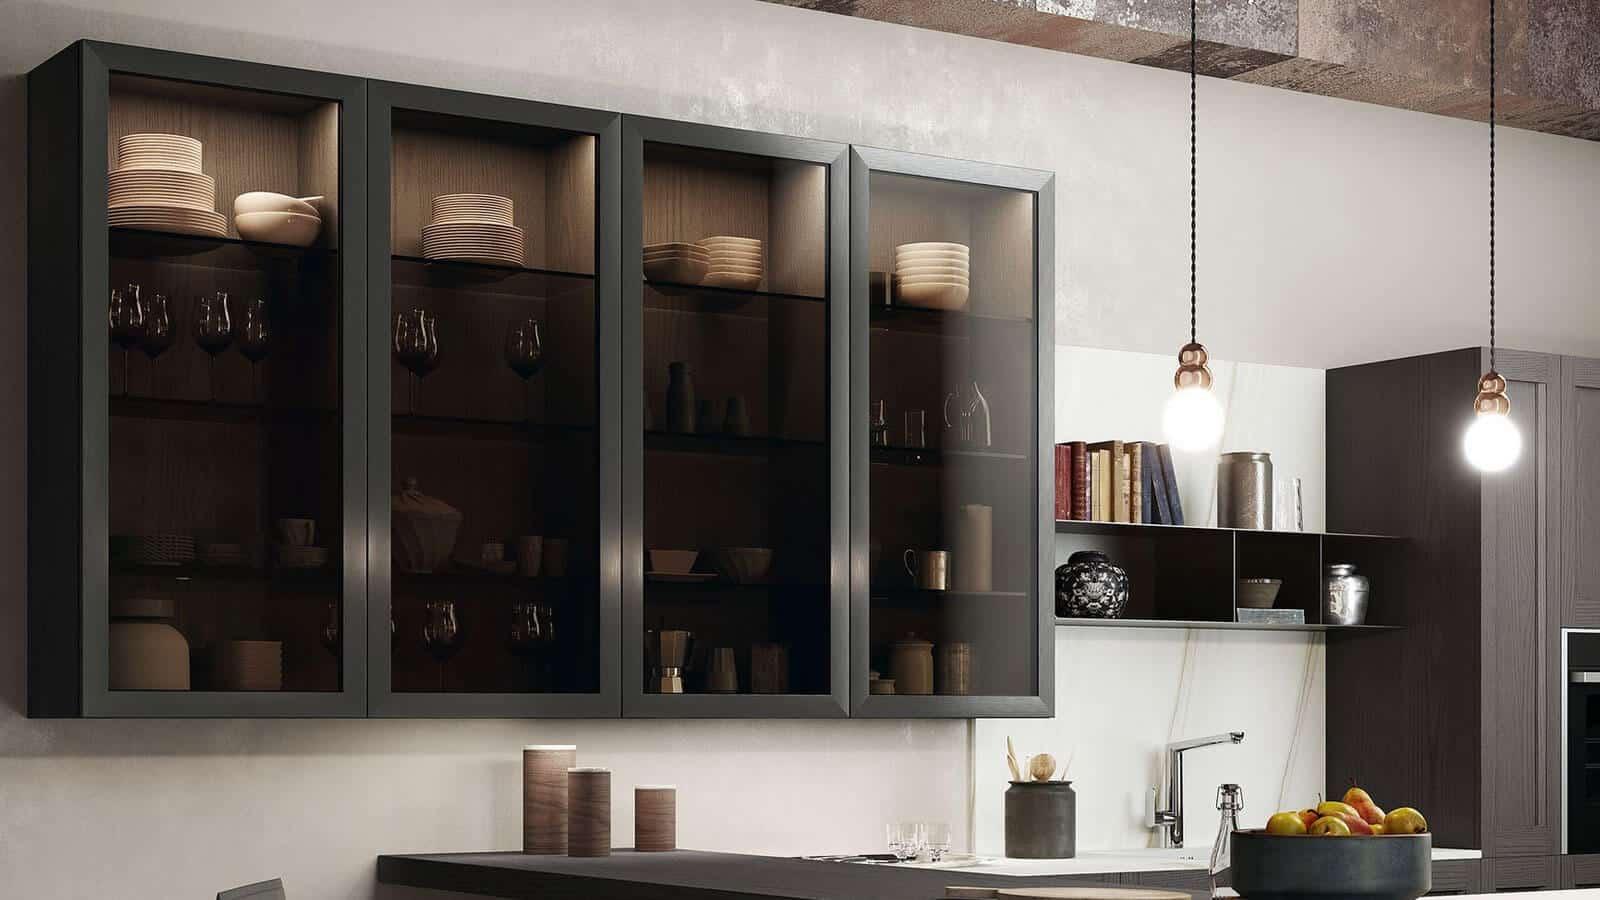 Meuble De Cuisine Industriel cuisine style industriel   fabrication italienne   optimal